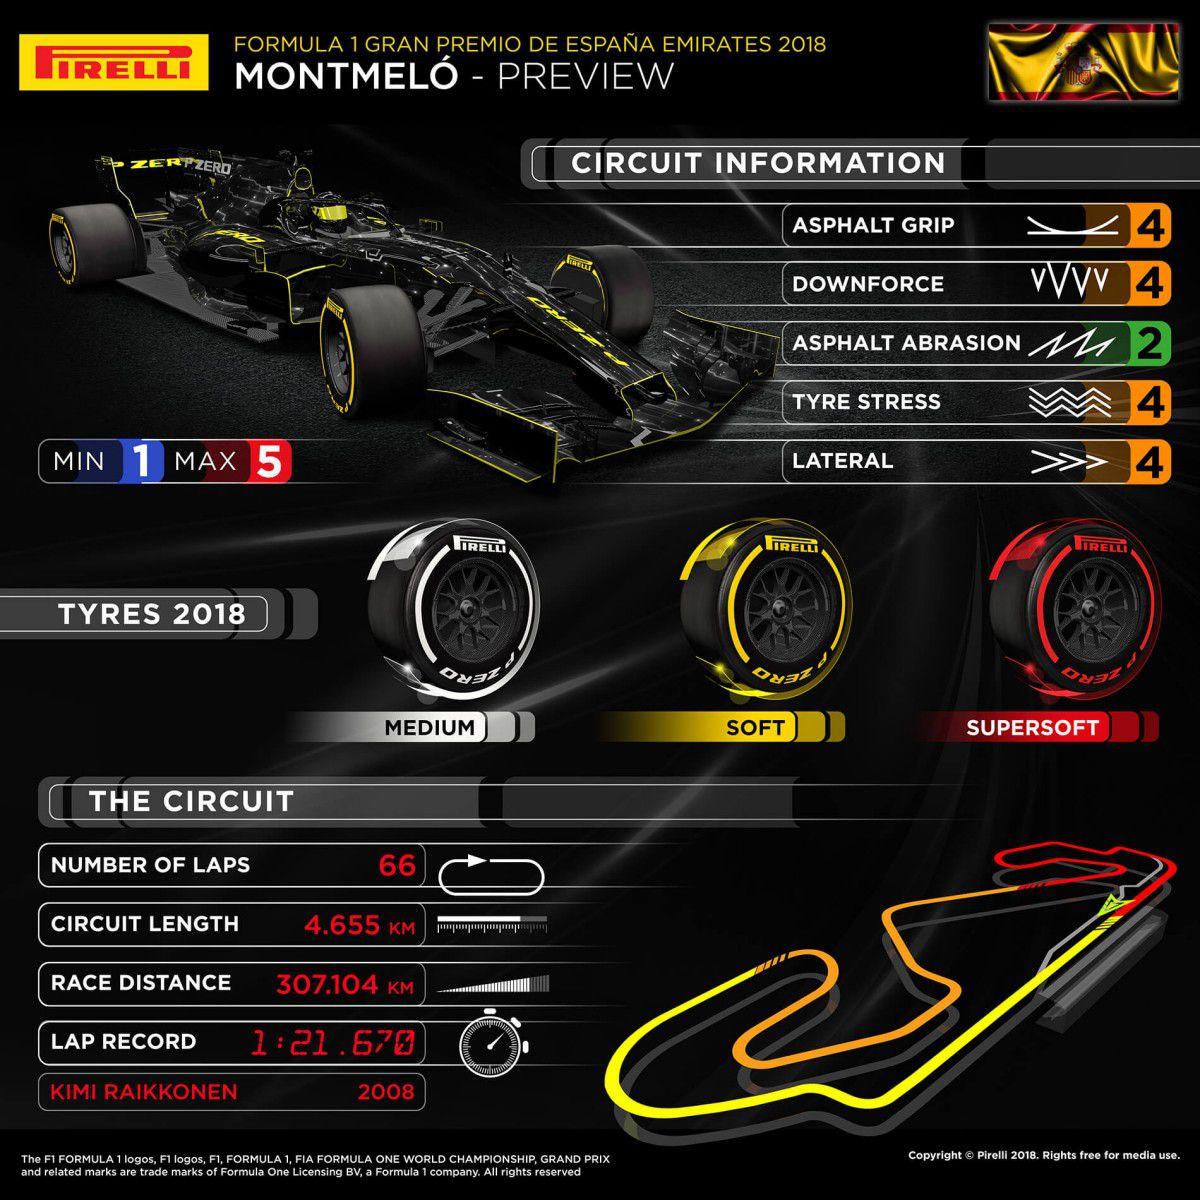 pirelli-espana-info.jpg